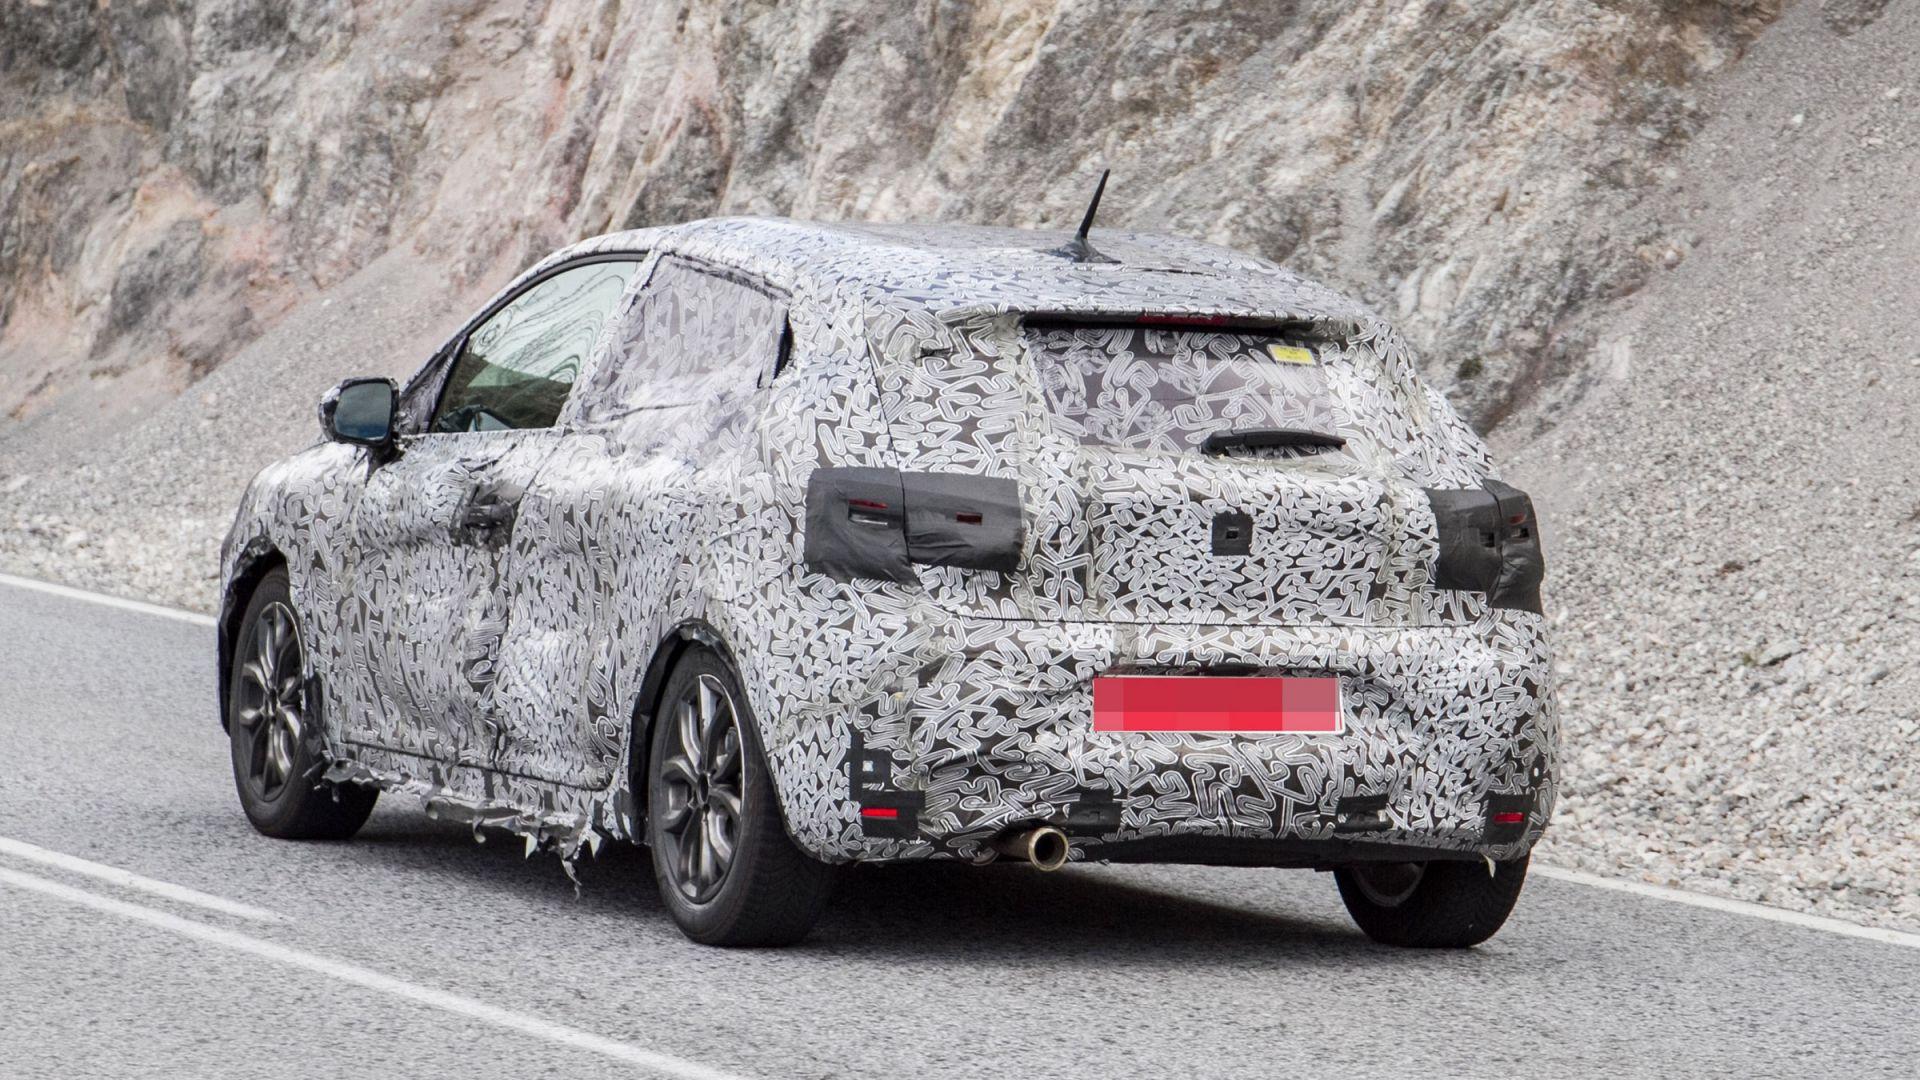 Subaru Brz Turbo >> Nuova Renault Clio 5 2019: foto, dimensioni, motori, uscita - MotorBox